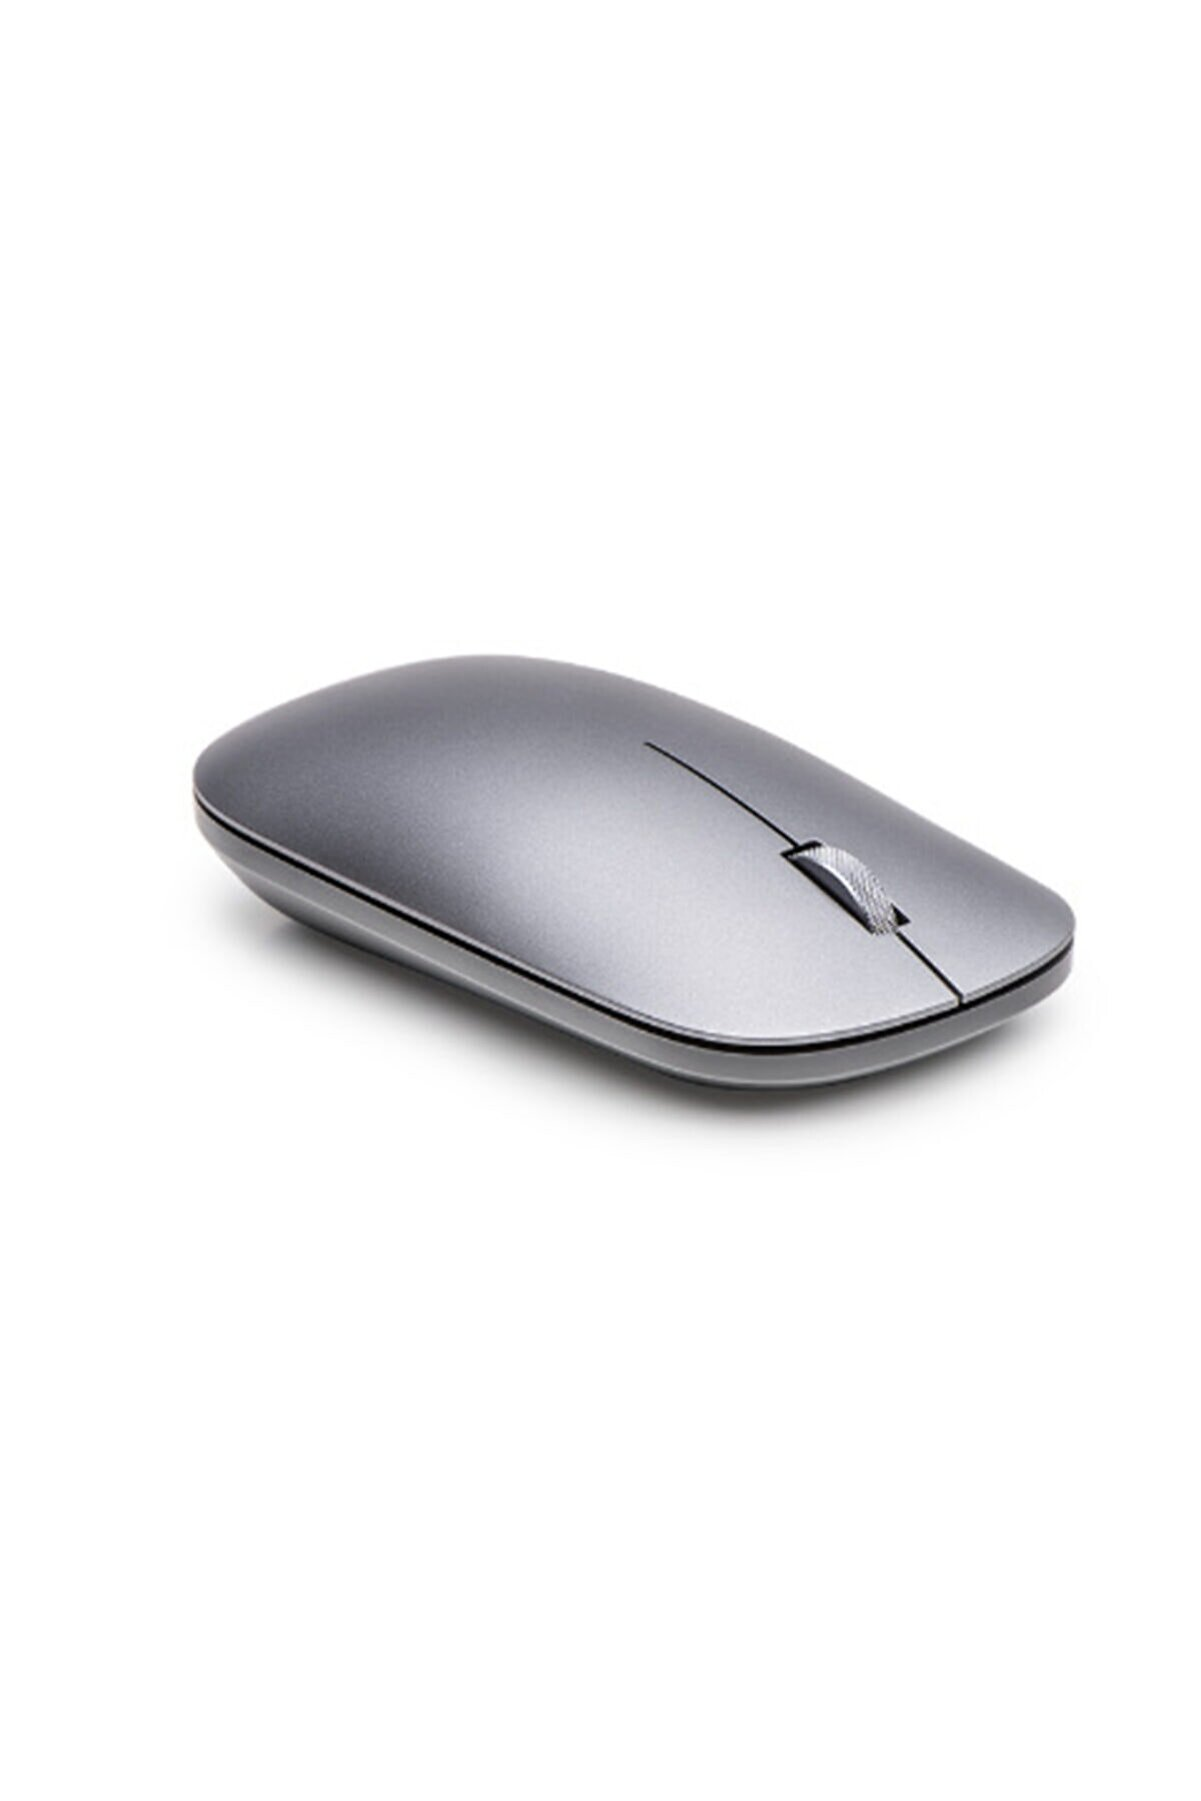 Huawei Gri Bluetooth Mouse Af30